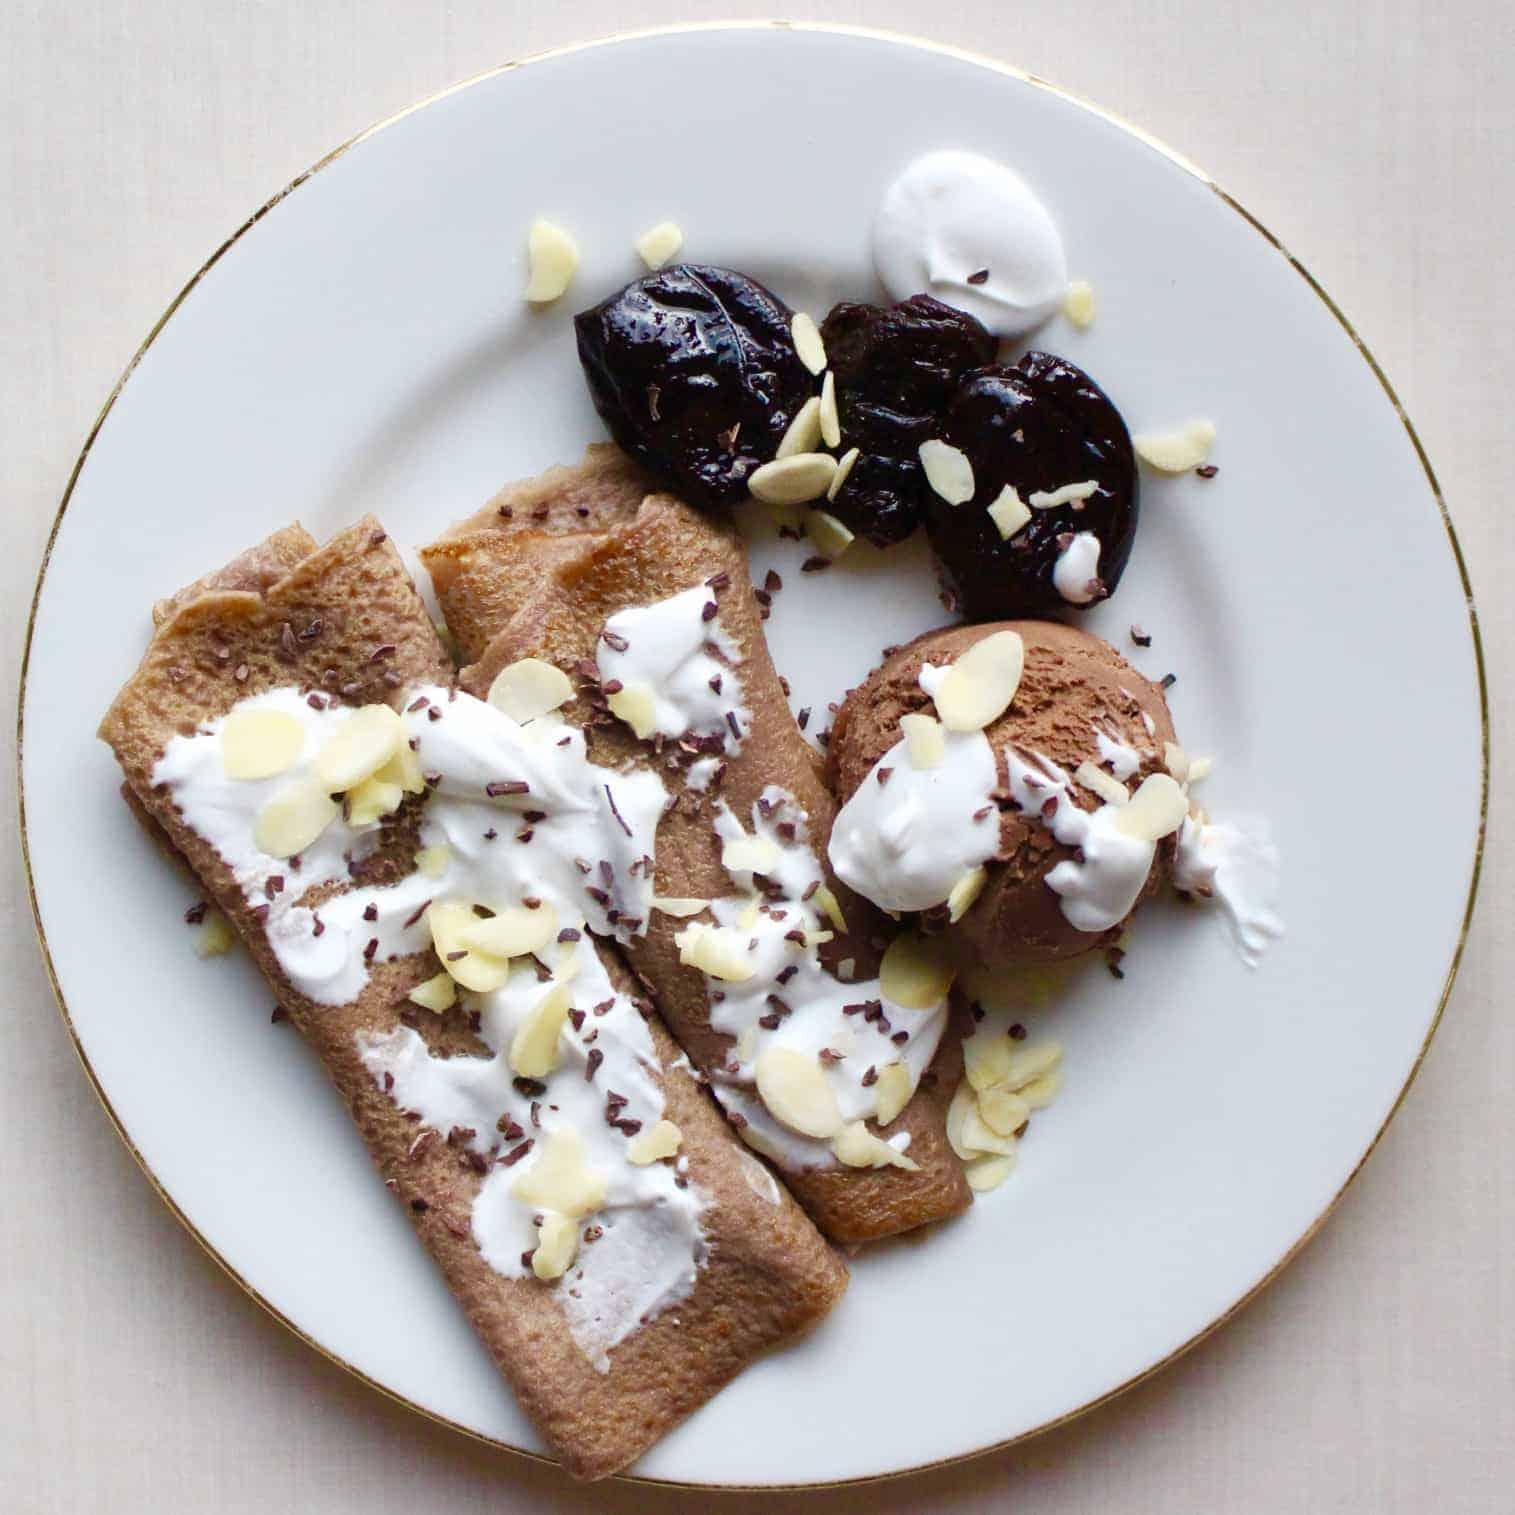 Amaretto Prune Chocolate Crepes